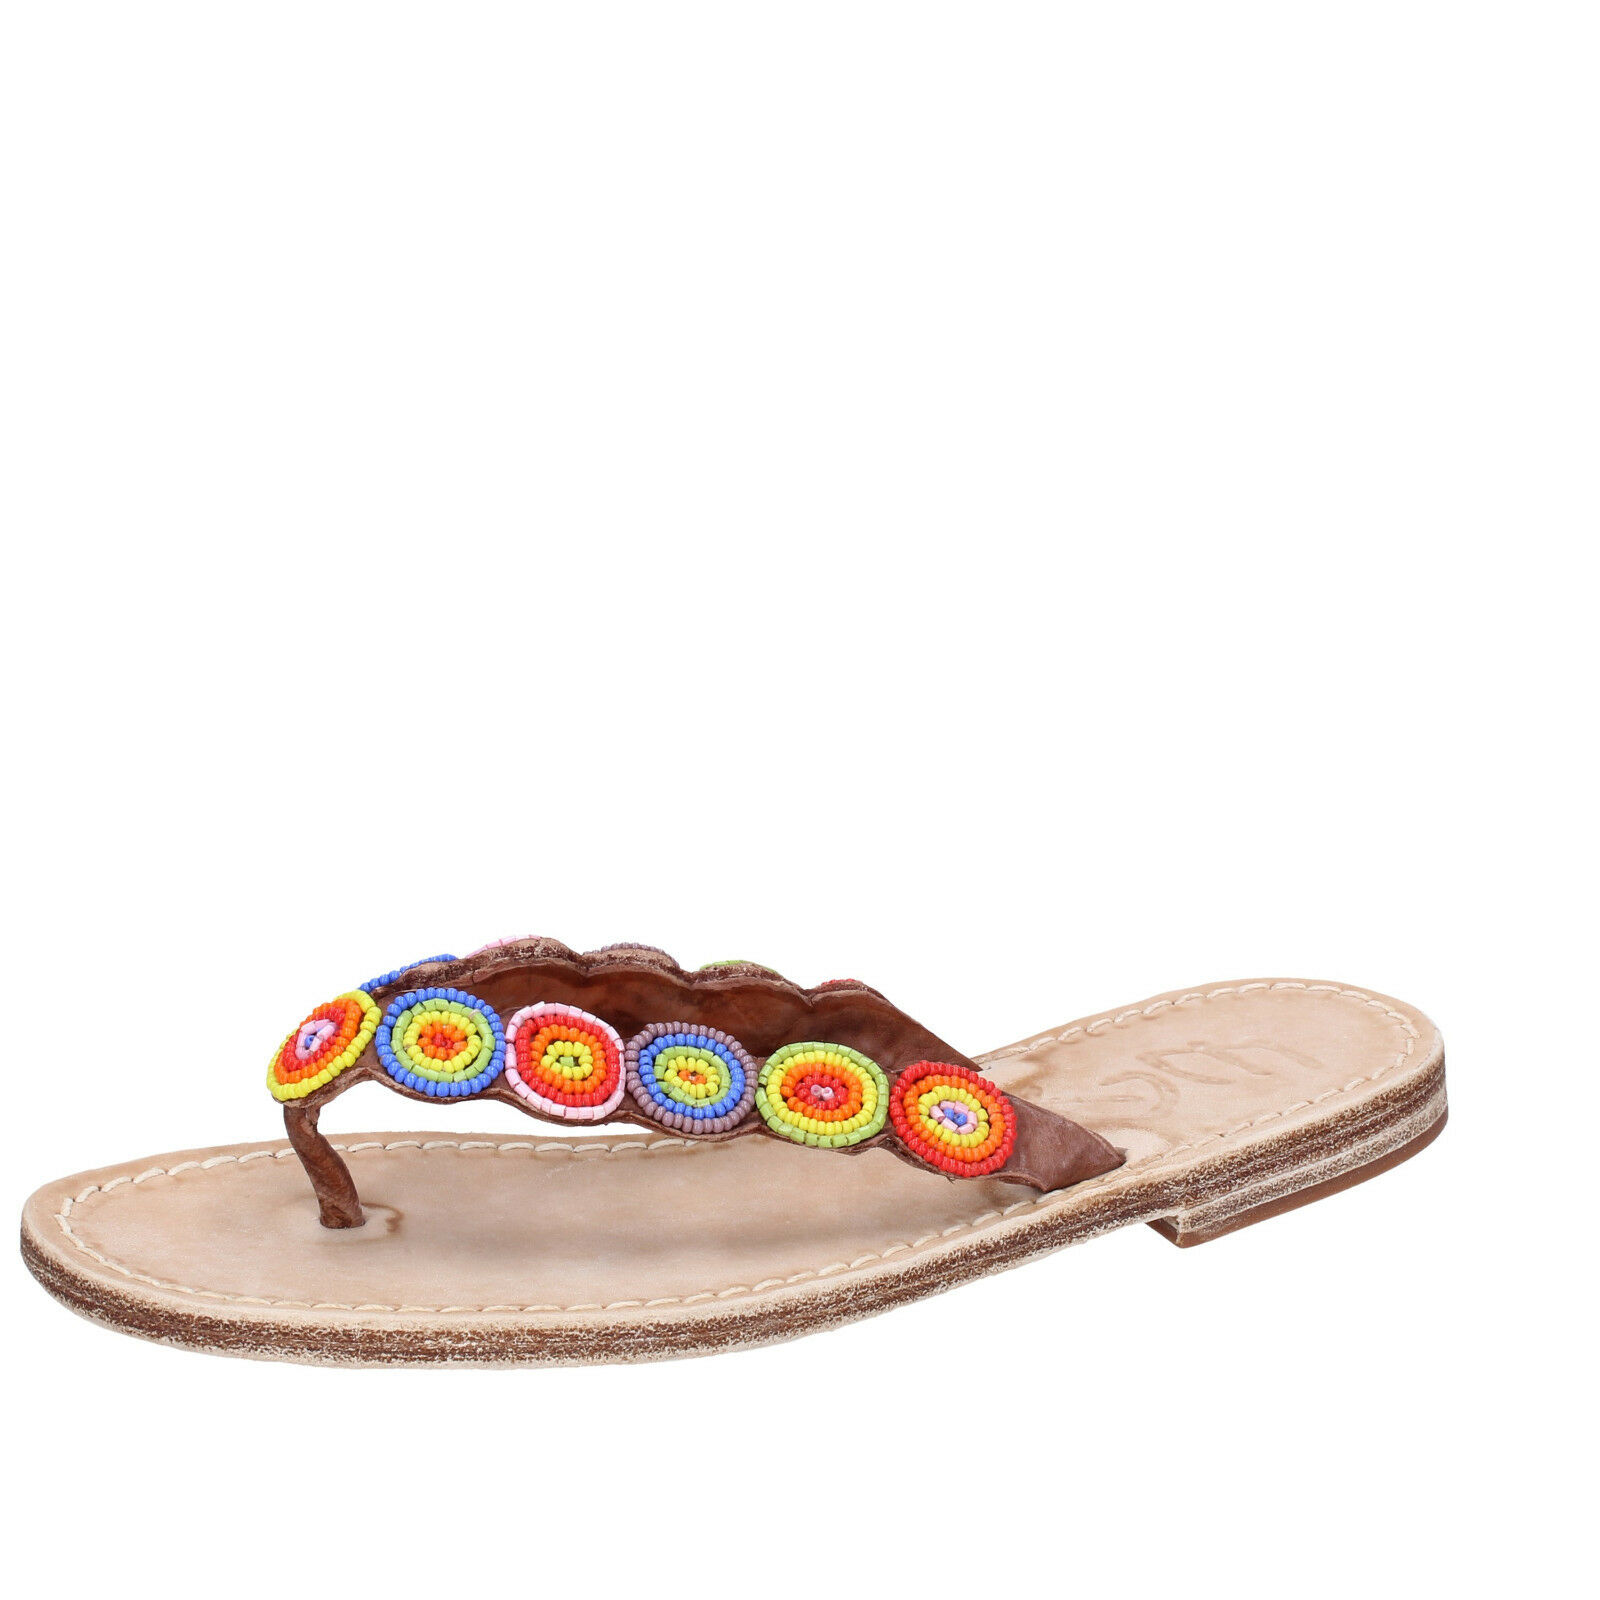 Womens shoes Eddy Daniele 37 EU Sandals Multi-Coloured Leather aw298